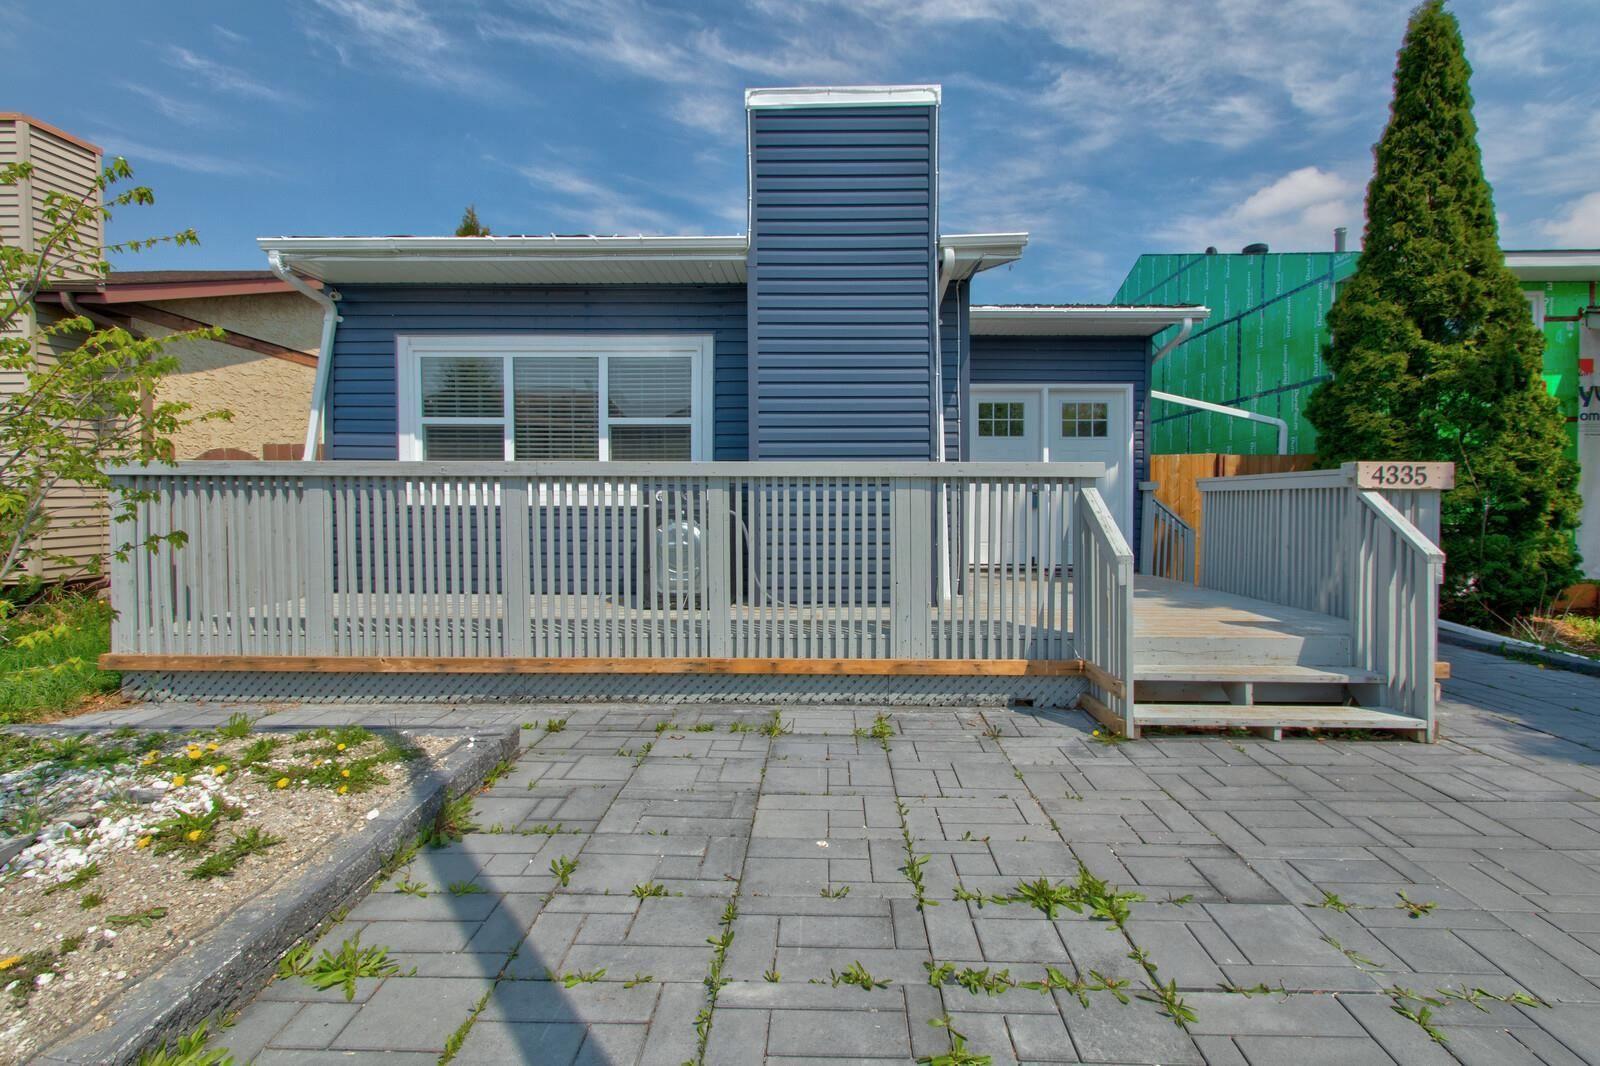 Main Photo: 4335 38 Street in Edmonton: Zone 29 House for sale : MLS®# E4245547